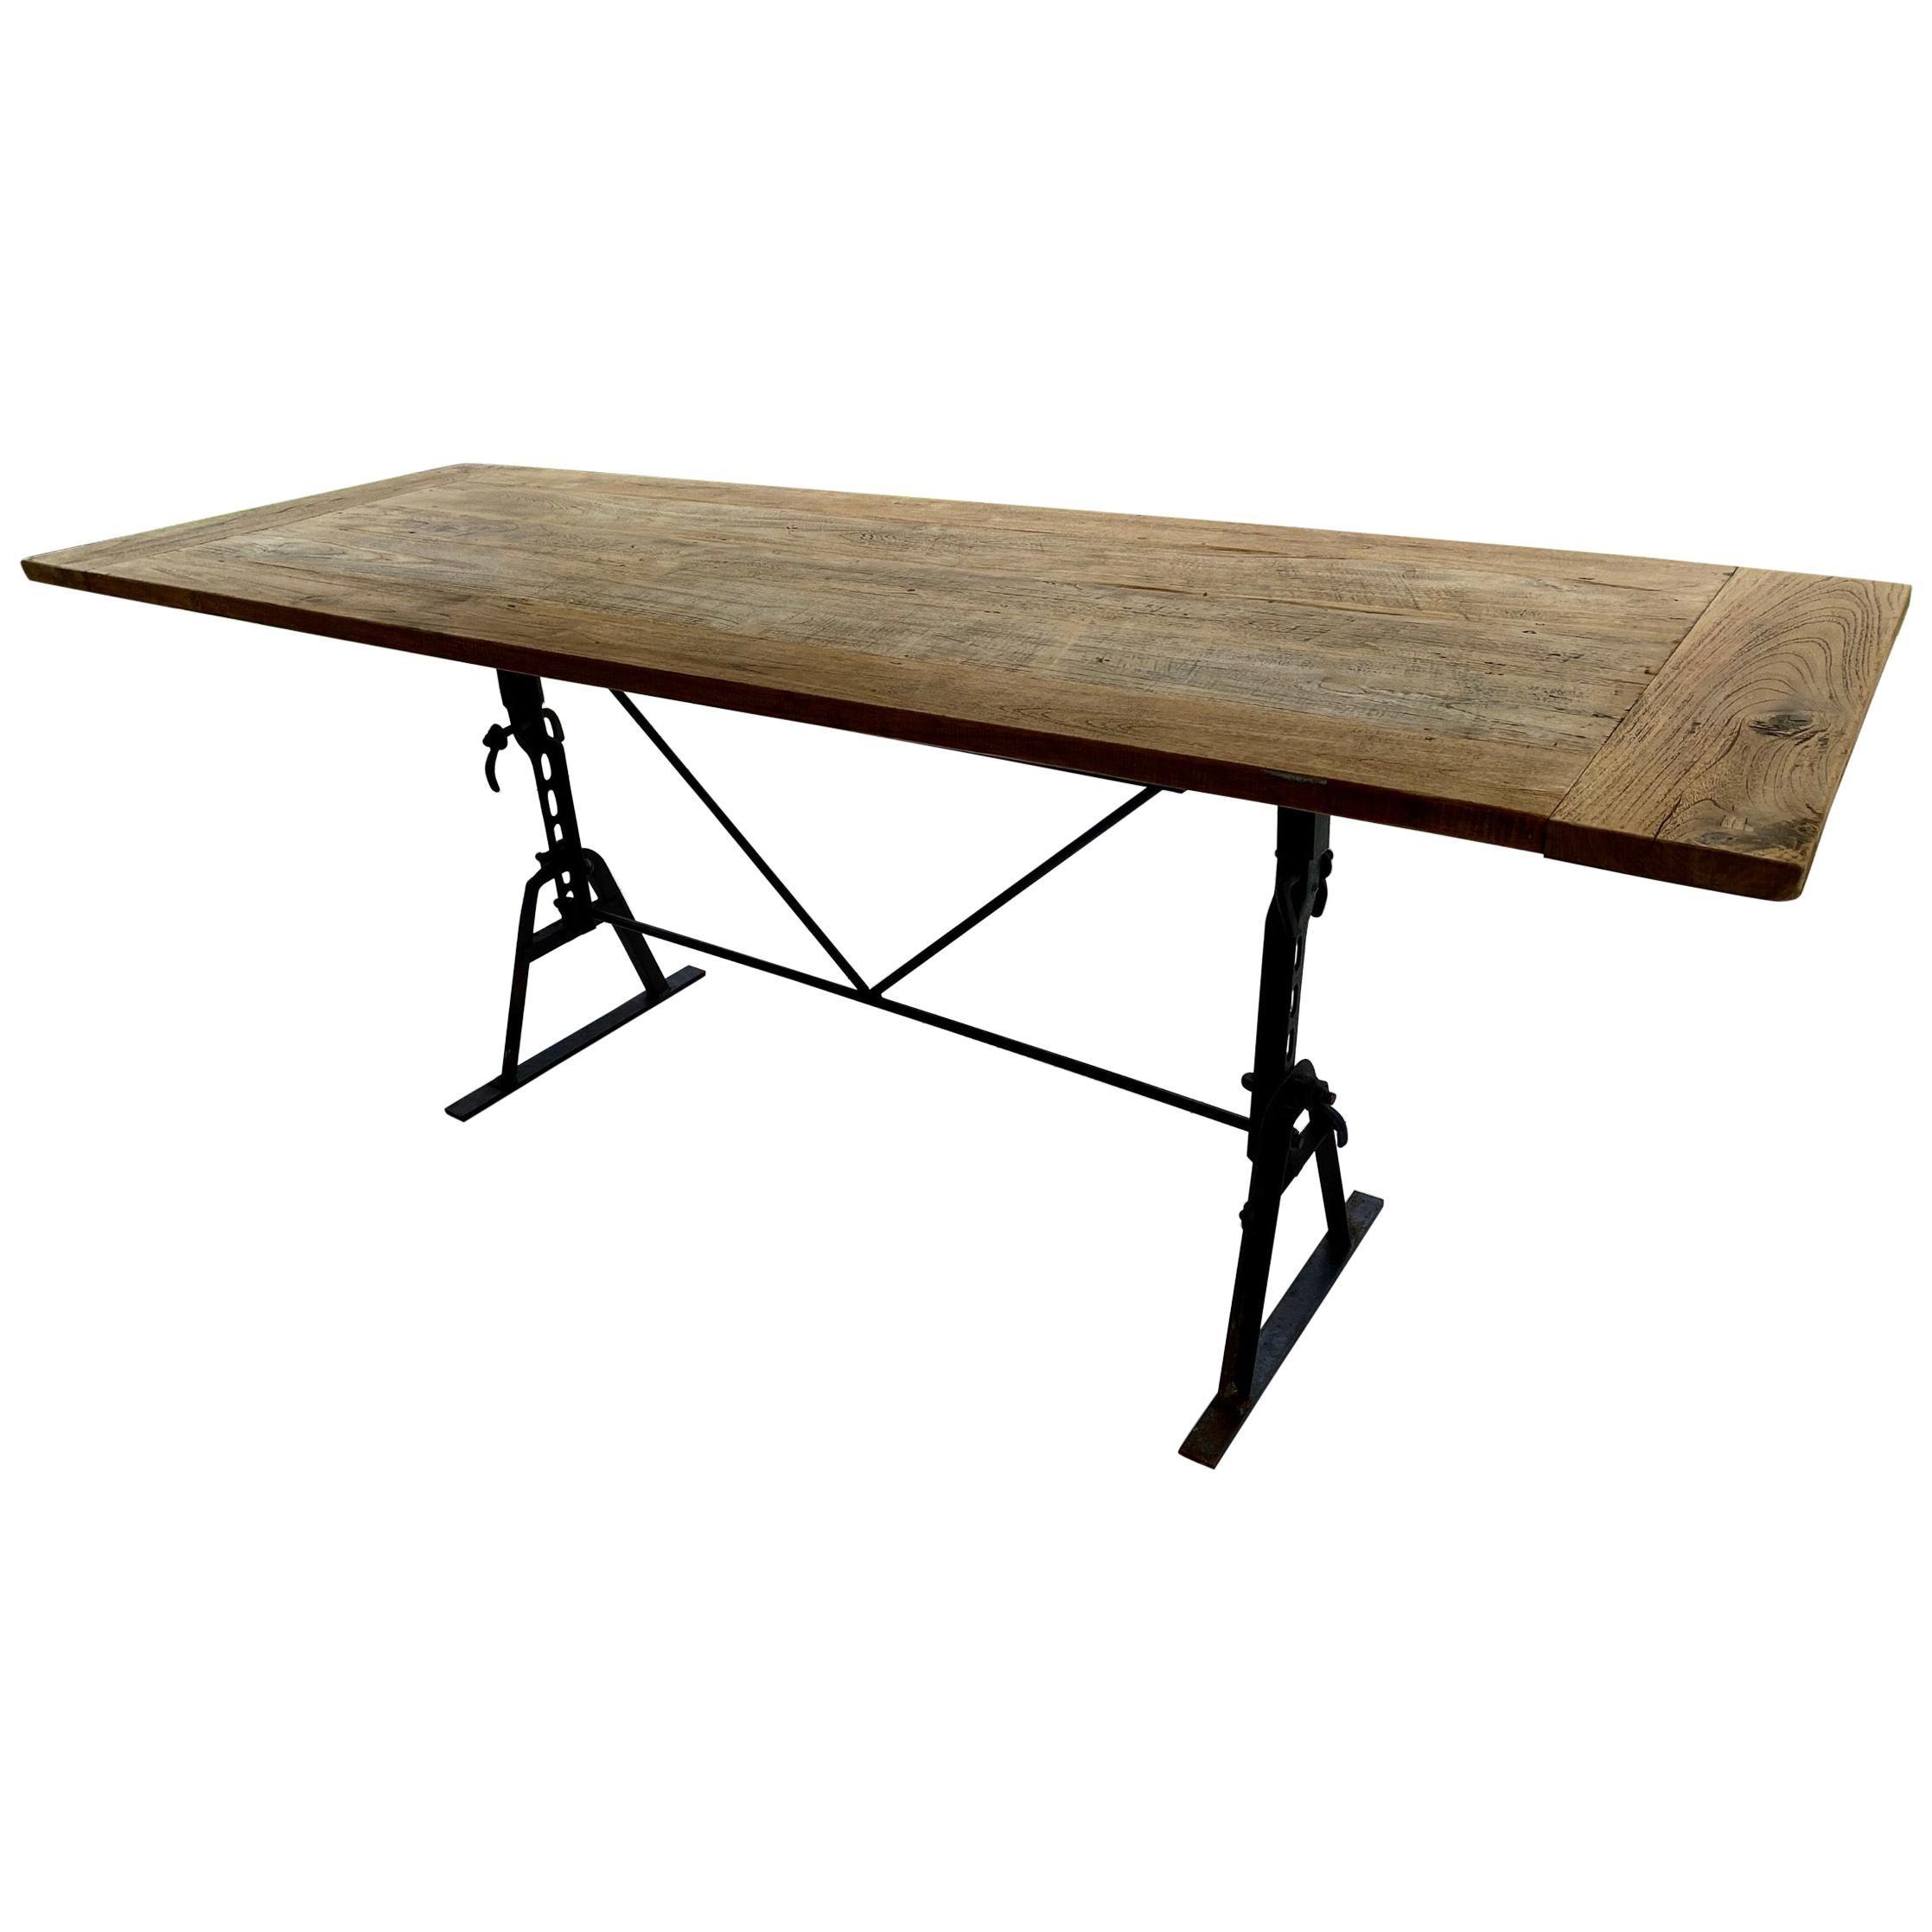 Industrial Metal Base and Teak Top Dining Table